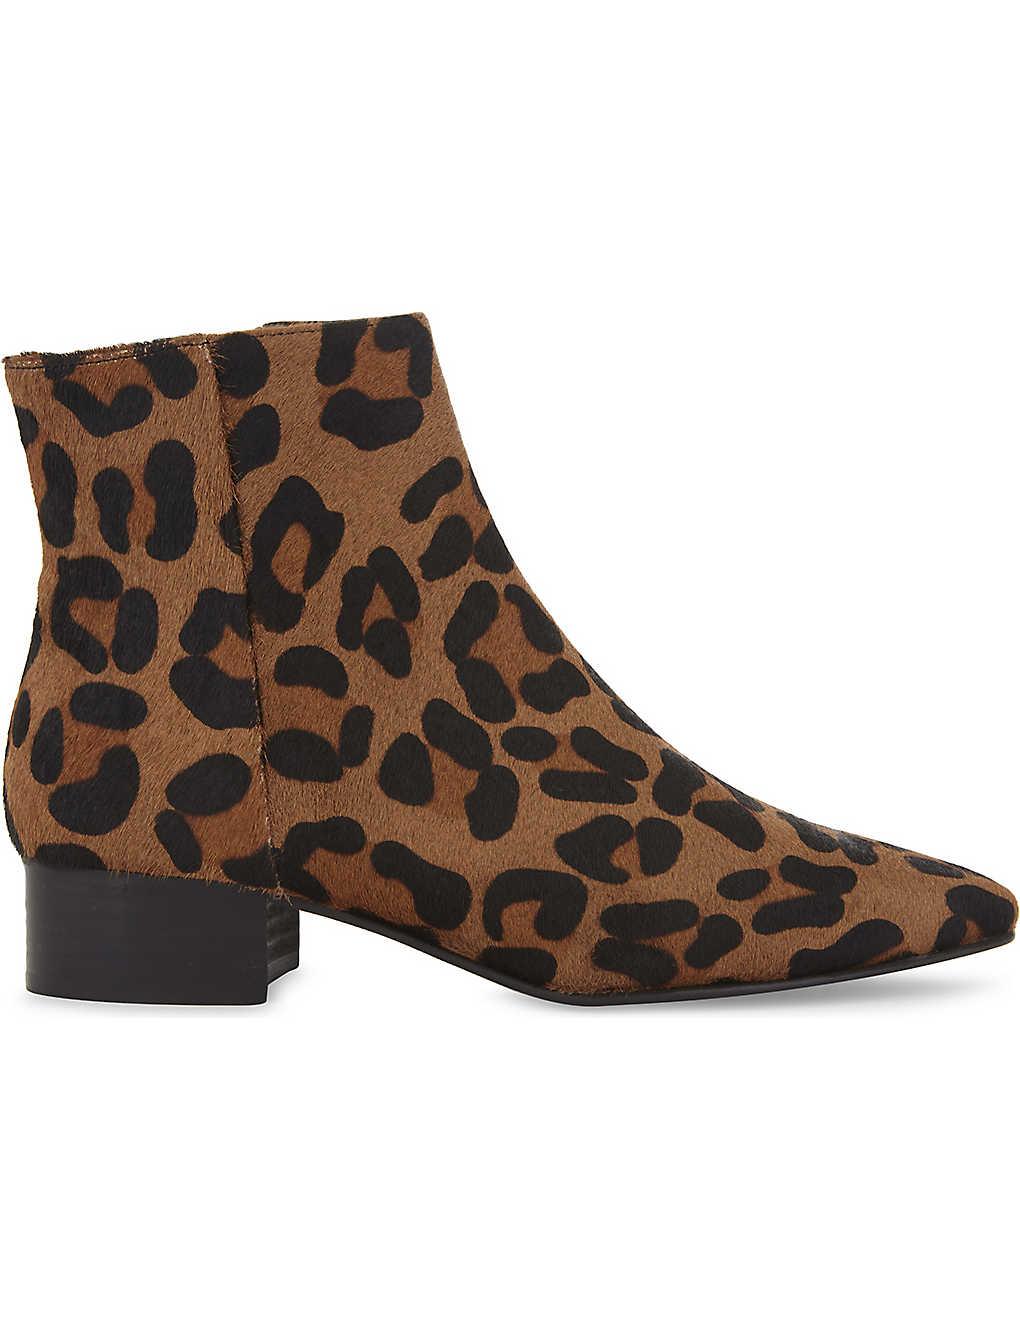 2ba9f60f98c9 WHISTLES - Berwick leopard-print ankle boots   Selfridges.com